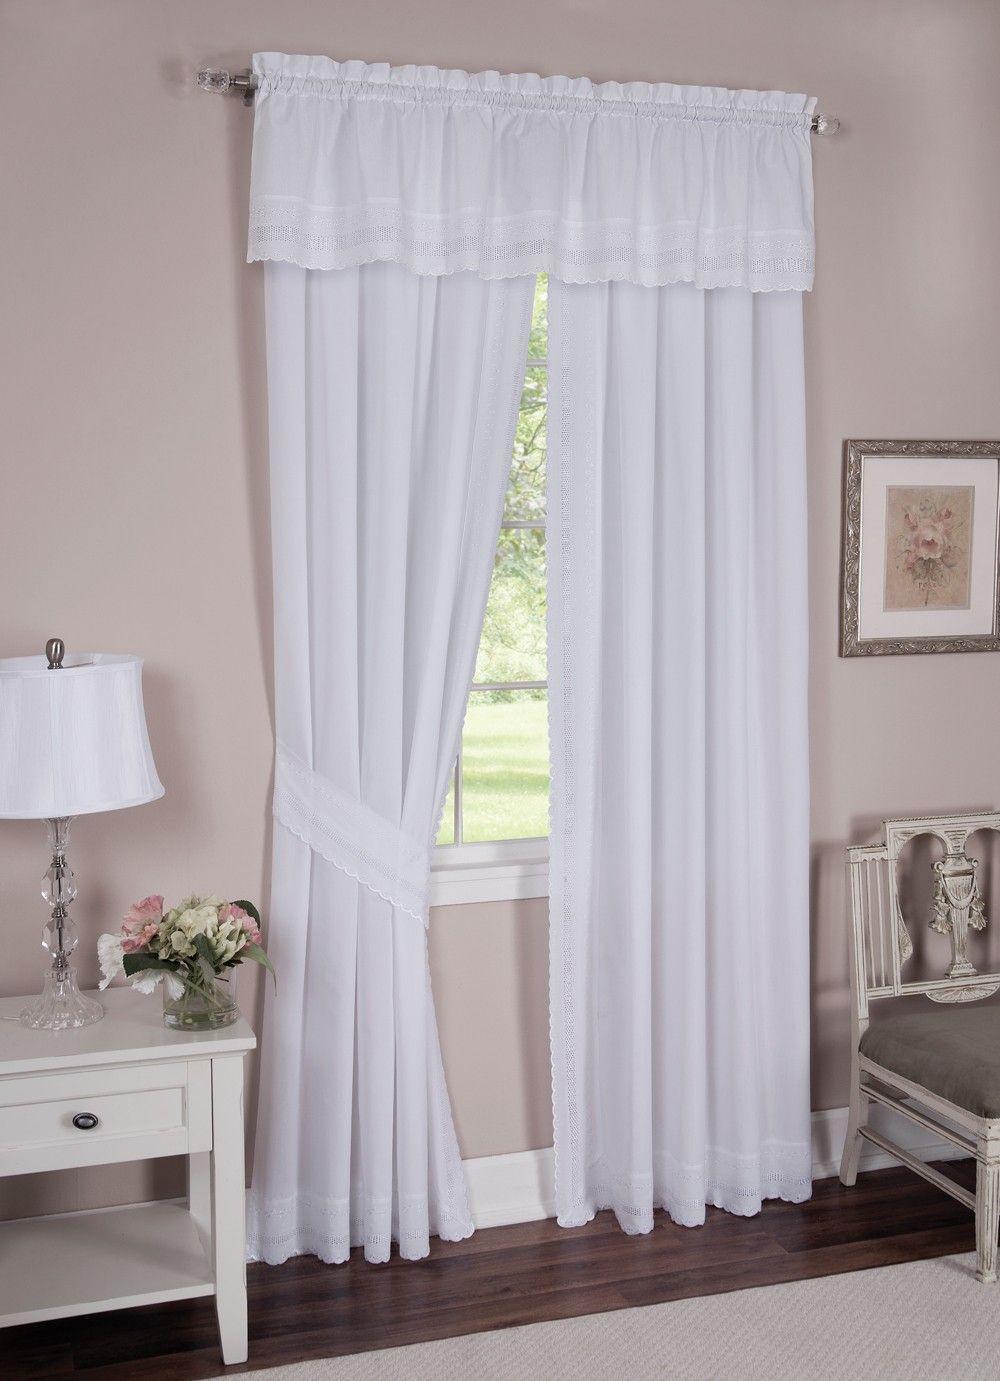 Danielle Eyelet White Curtain Panel Pair Curtain Bath Outlet